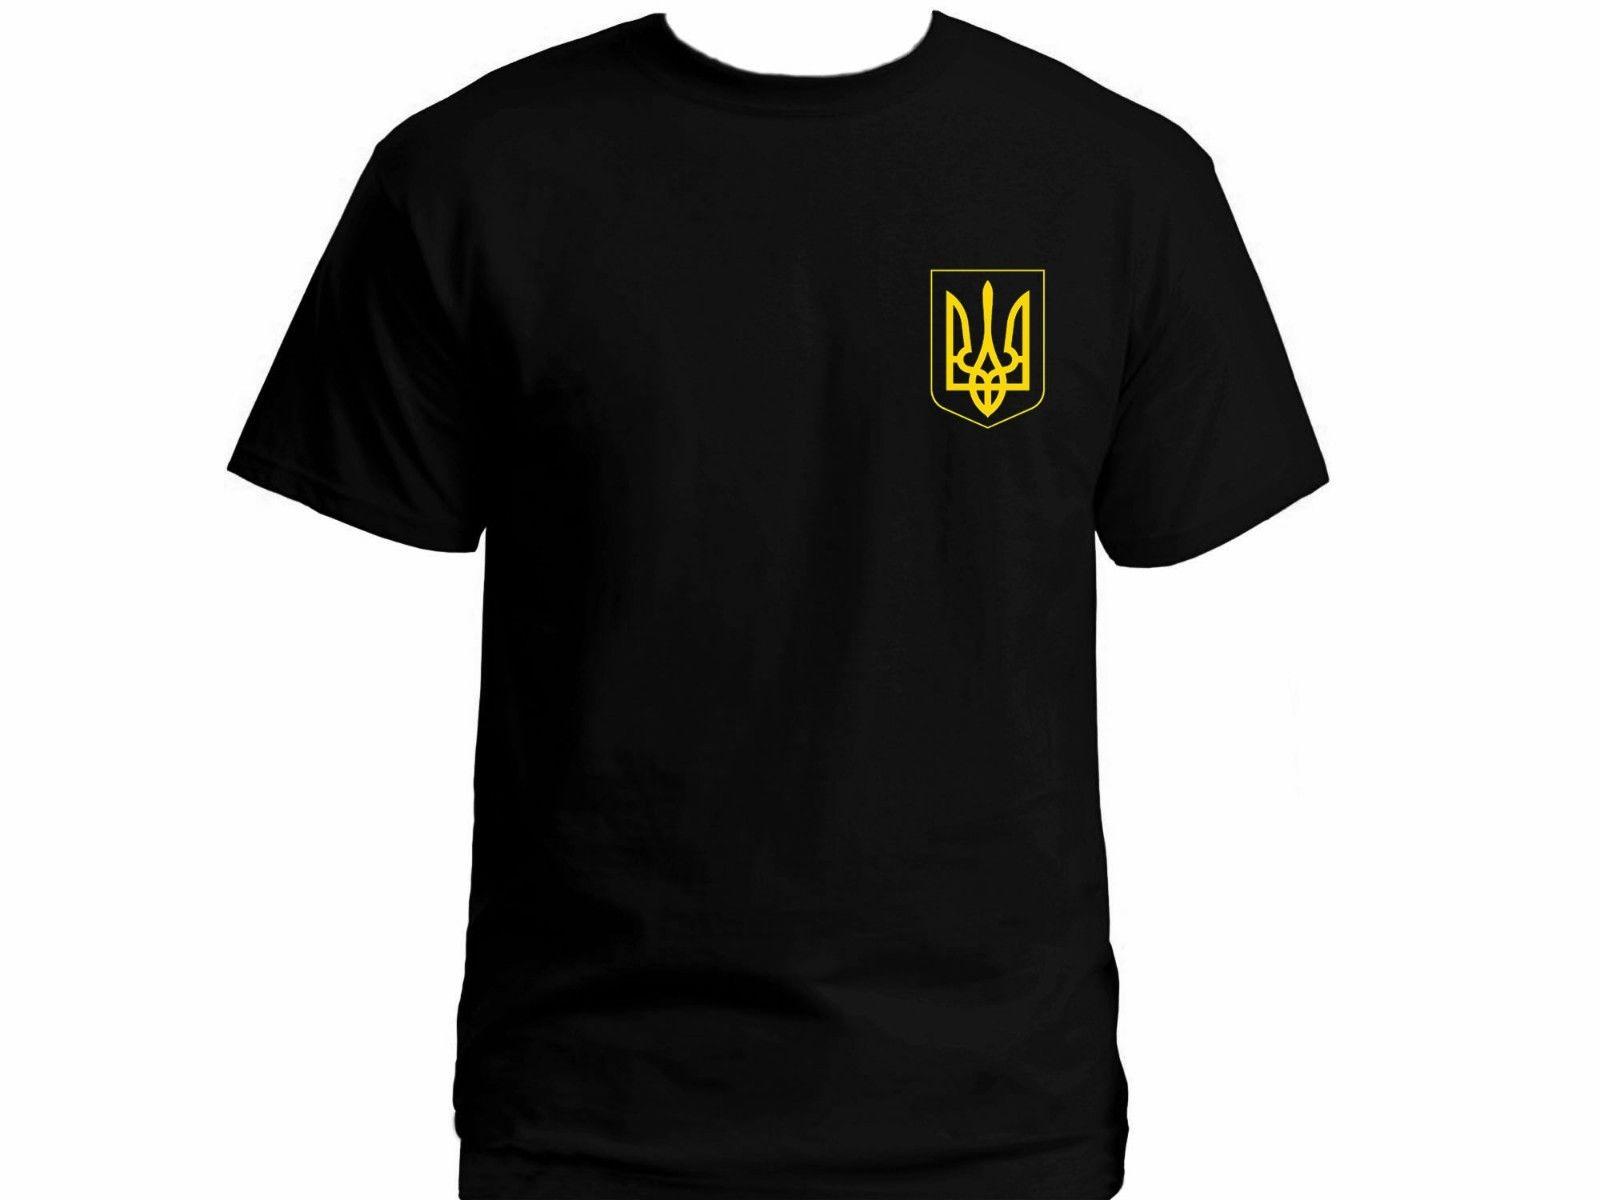 2019 bandera ucraniana Ucrania patriot signo tryzub negro 100% algodón nueva camiseta US XXL